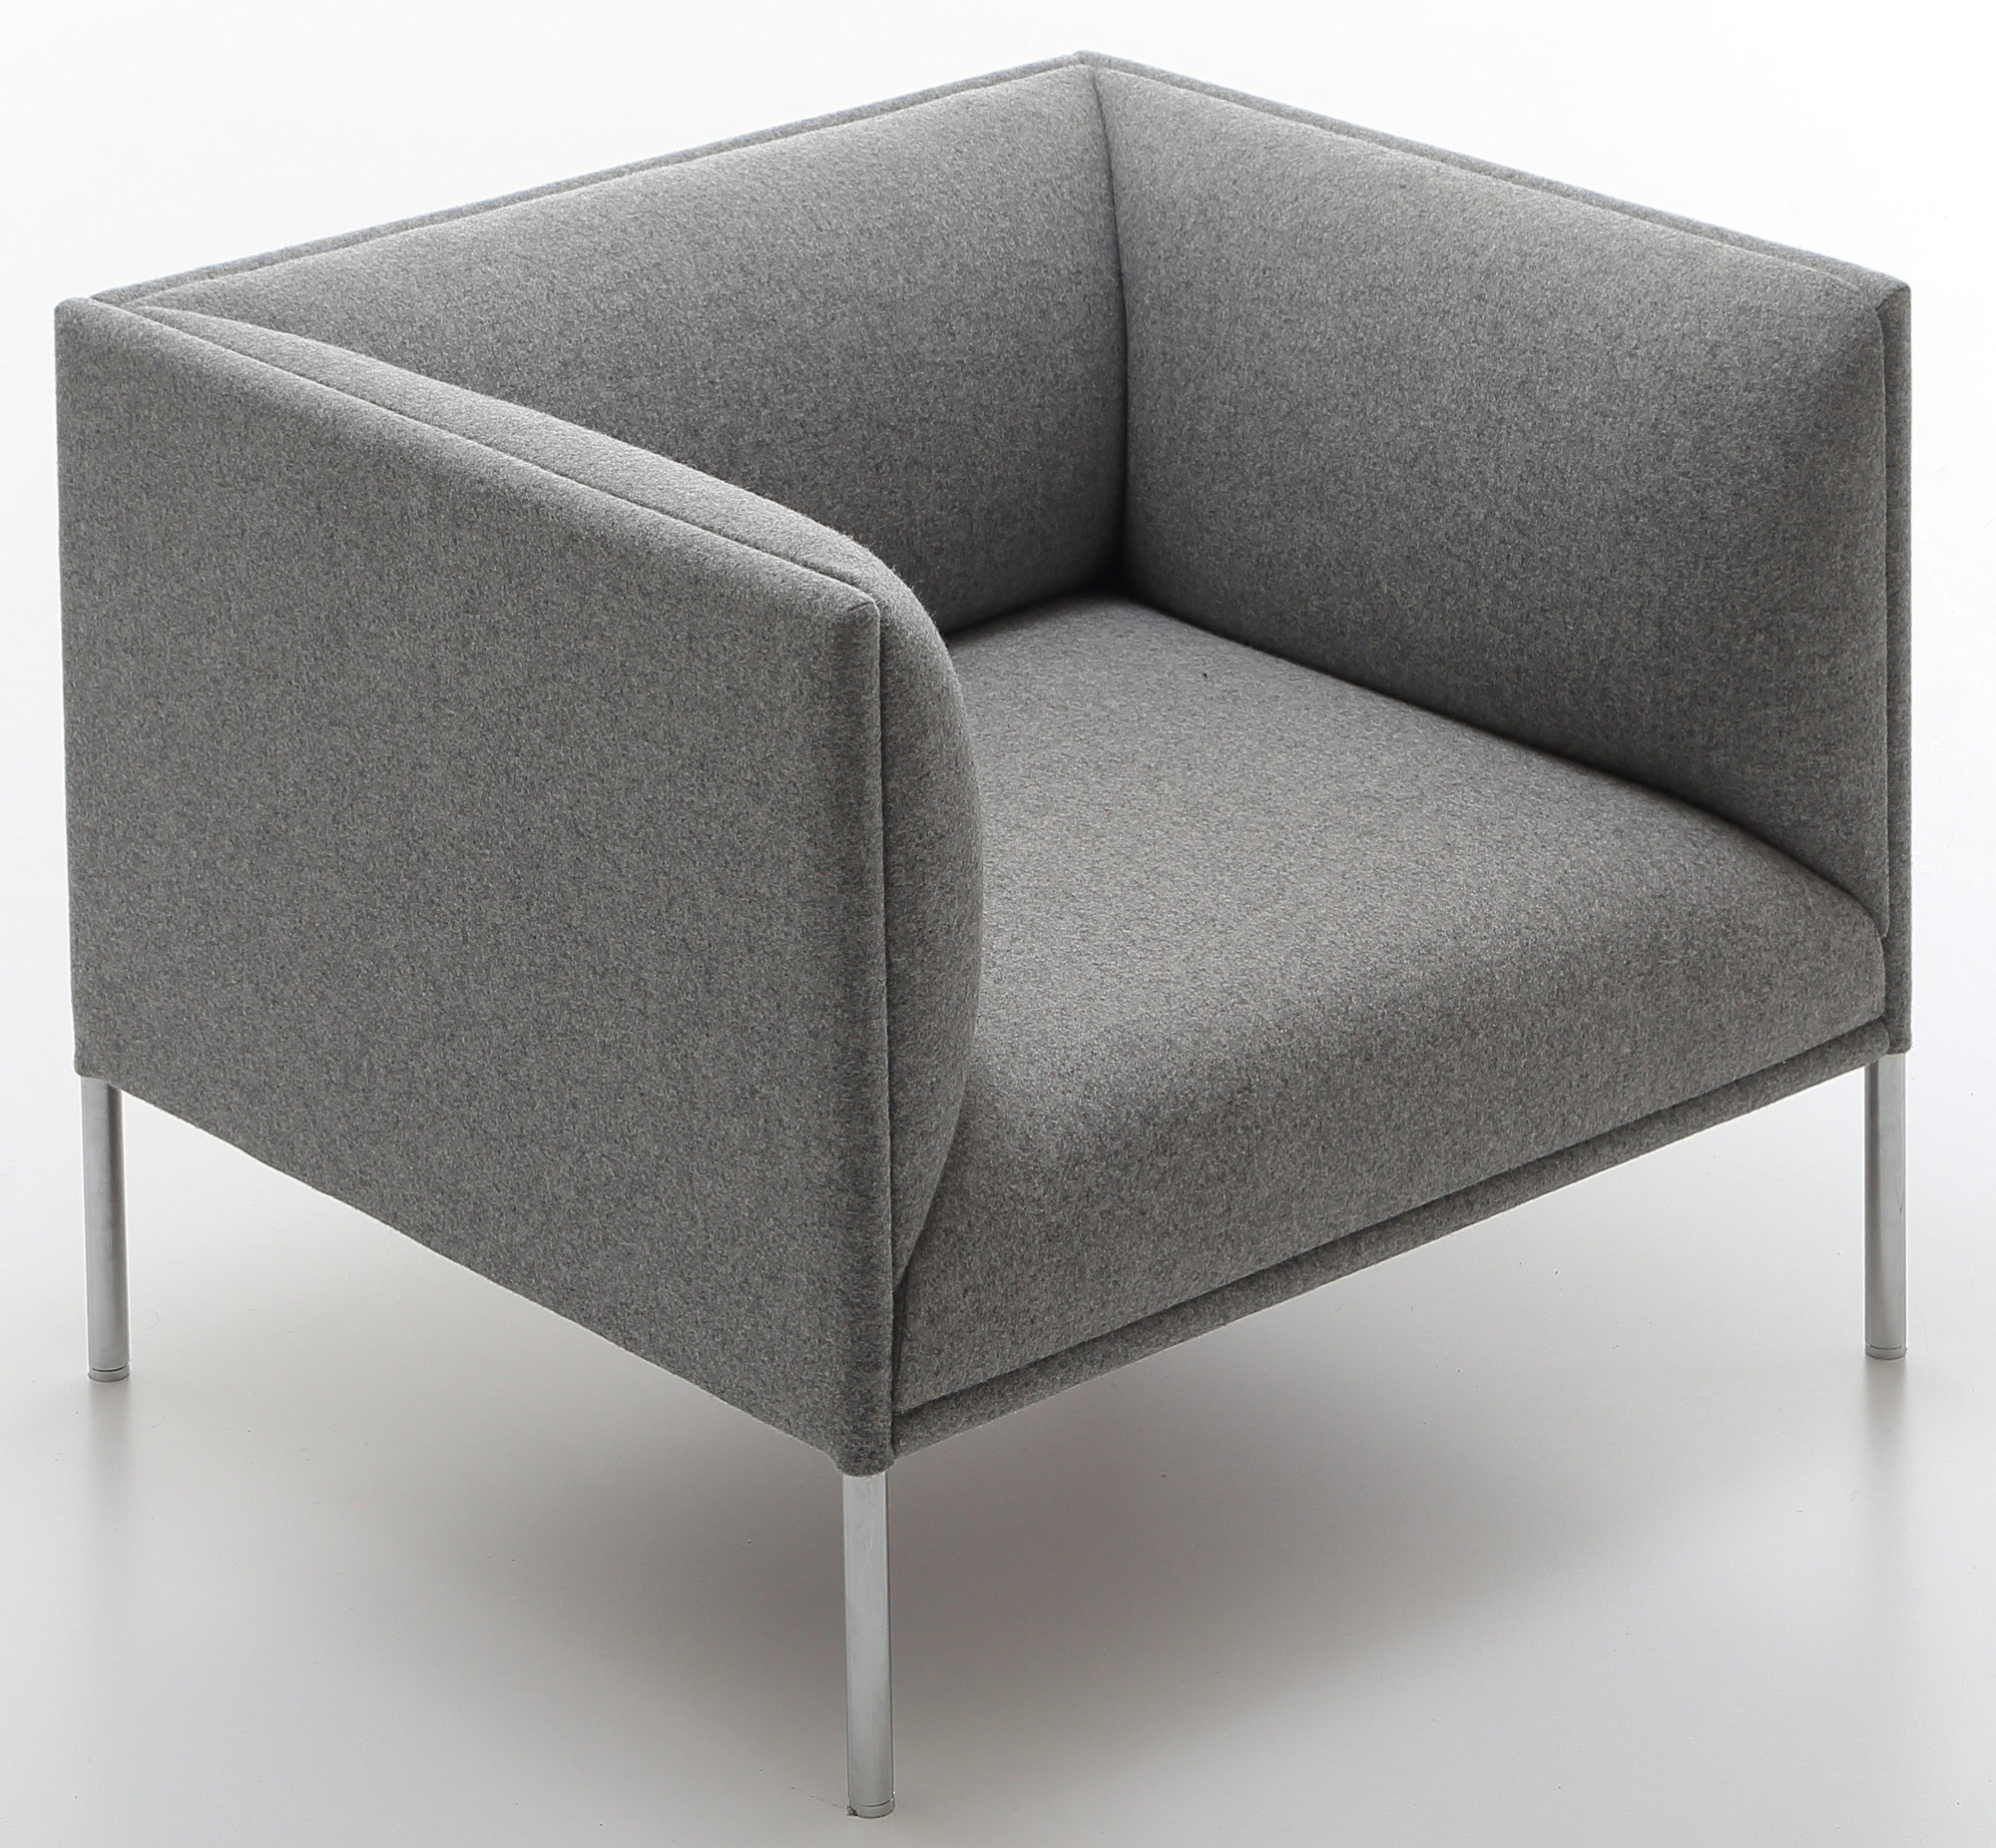 Comfortabele Design Fauteuil.Fauteuil City Design Fauteuils Mv Kantoor